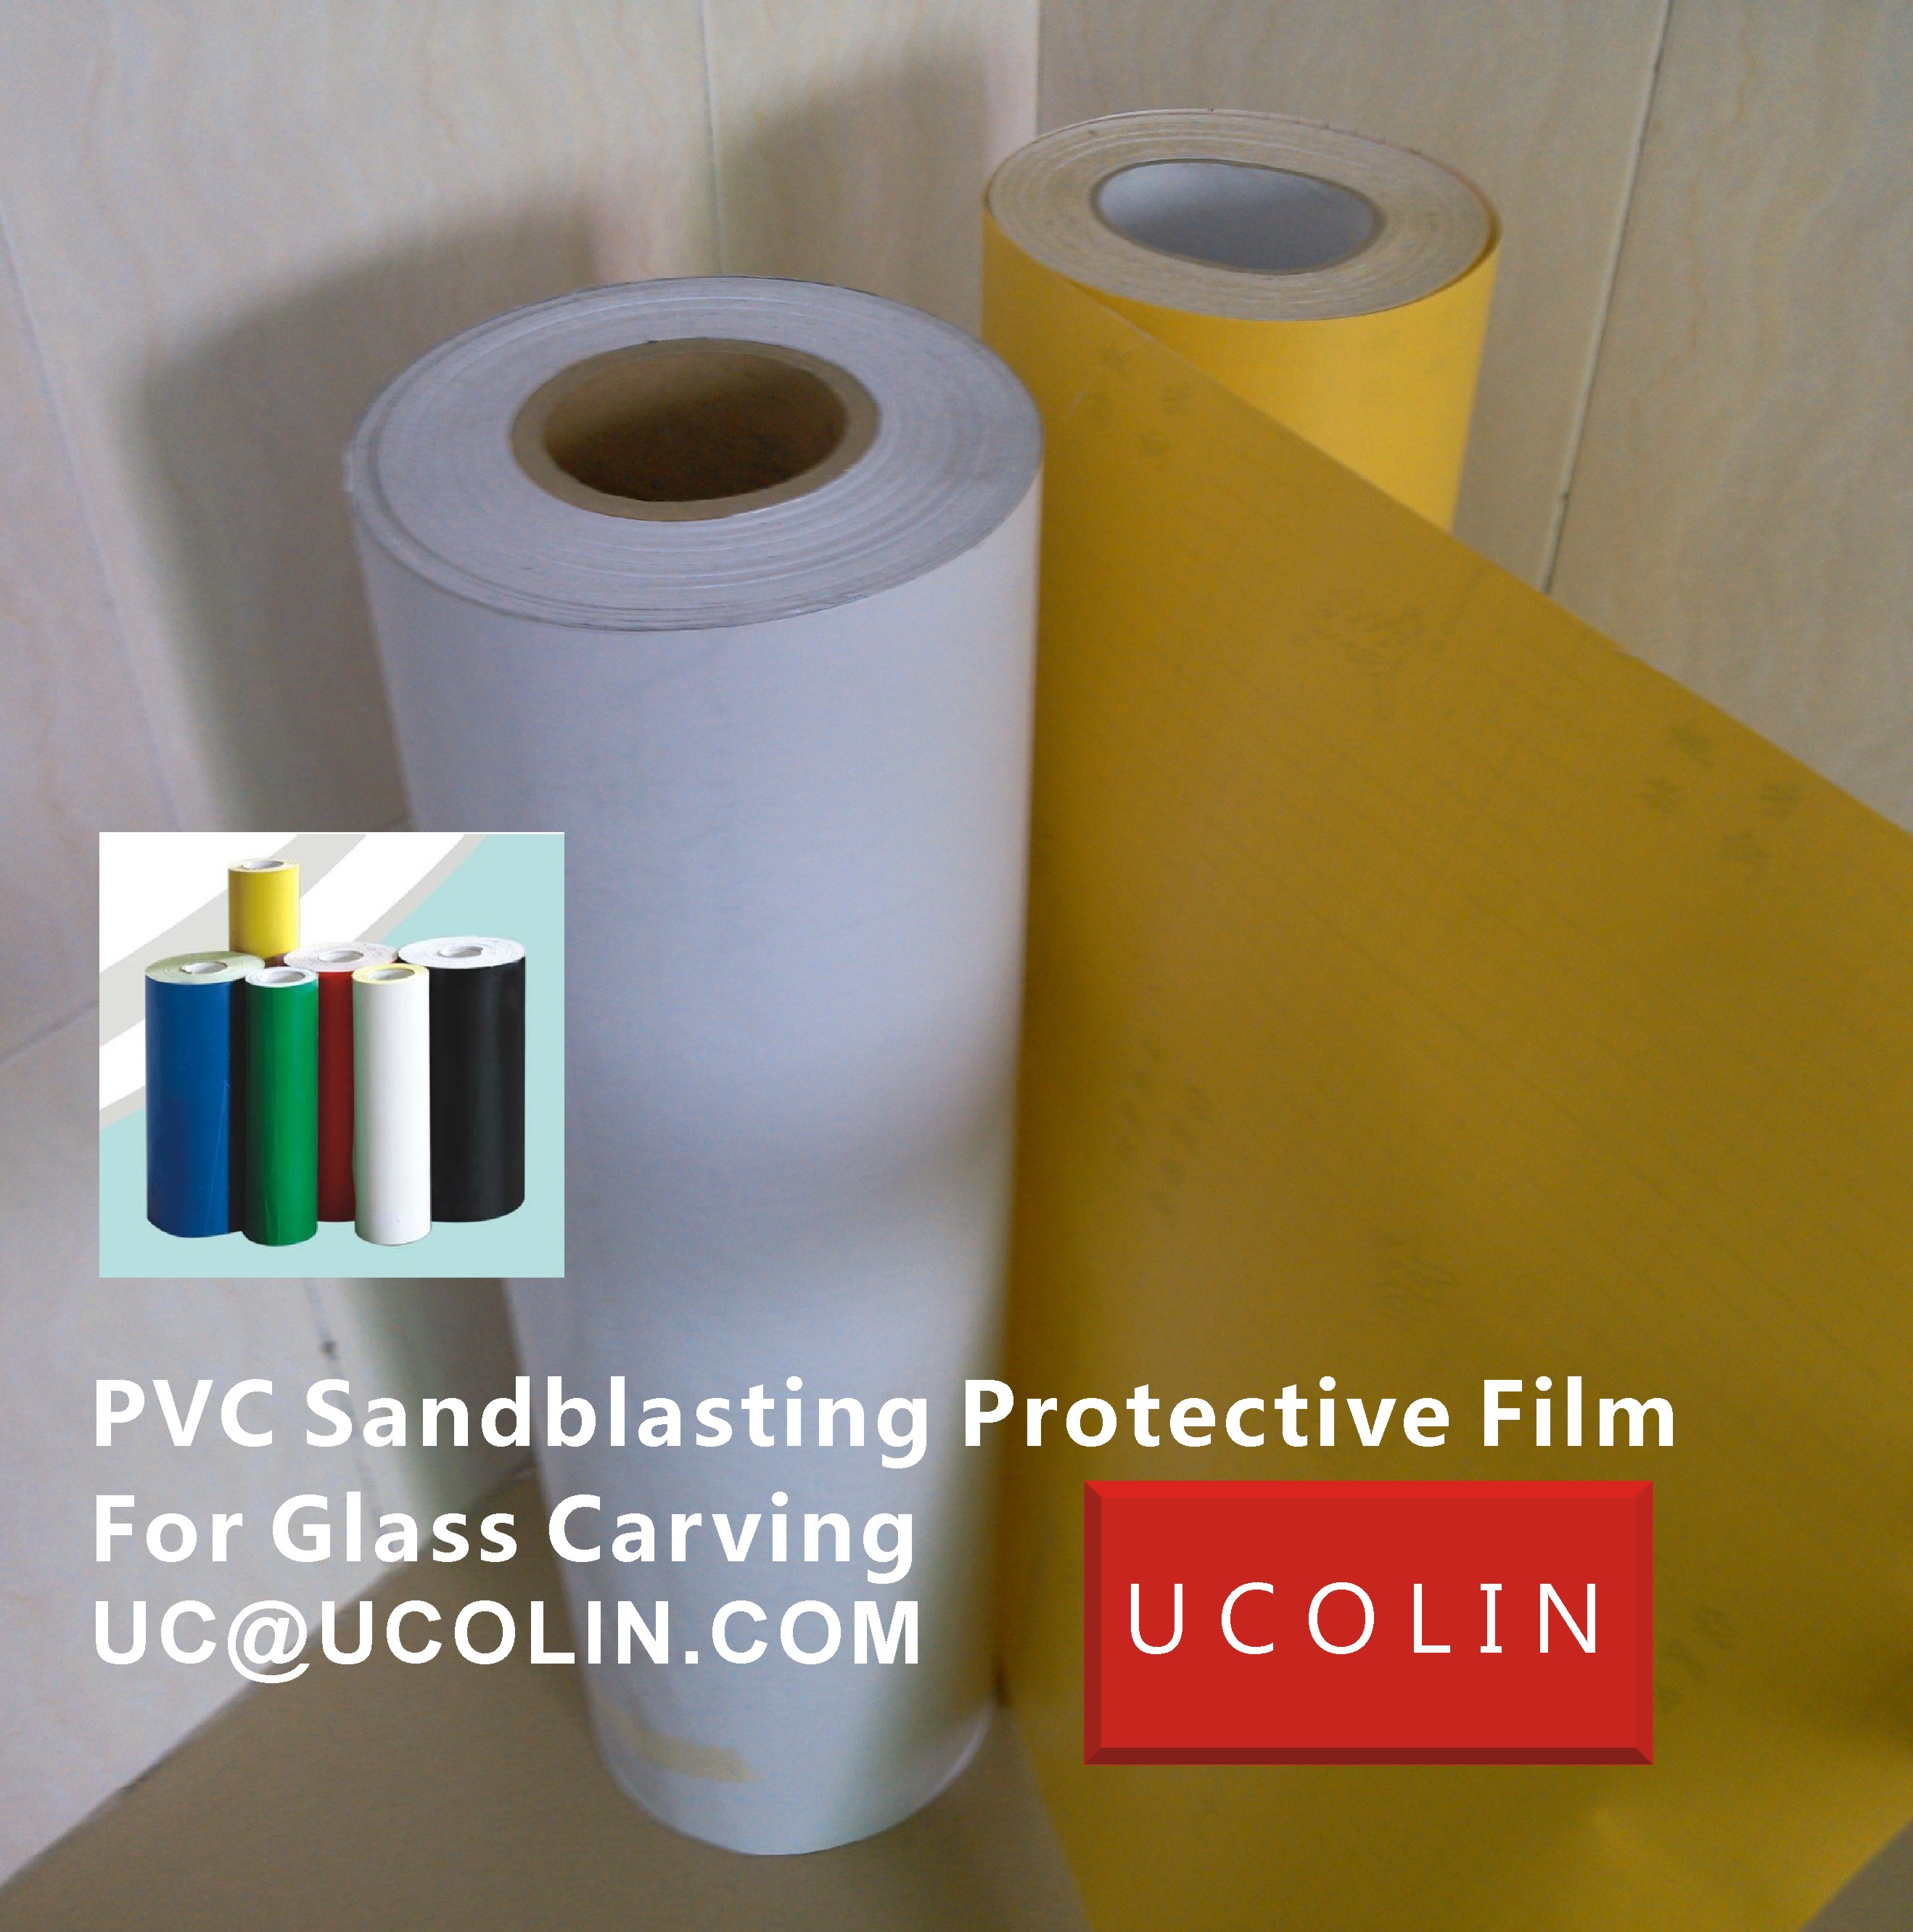 02 PVC Sandblasting Protective Film For Glass Carving